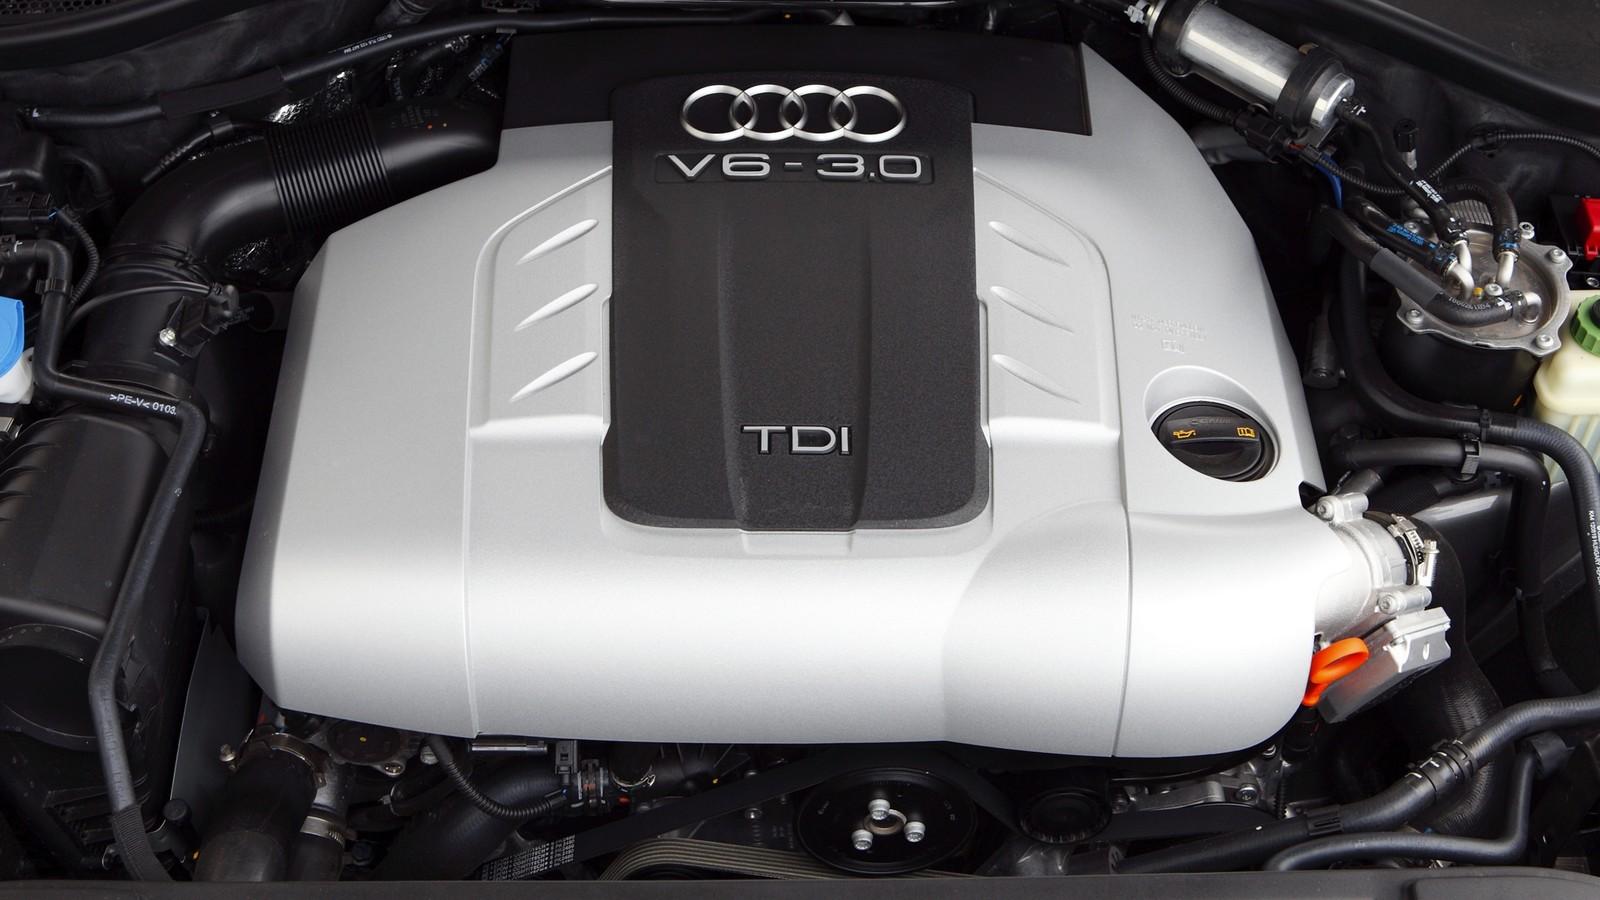 двигатель 3.0 tdi audi пробег более 100 тысяч